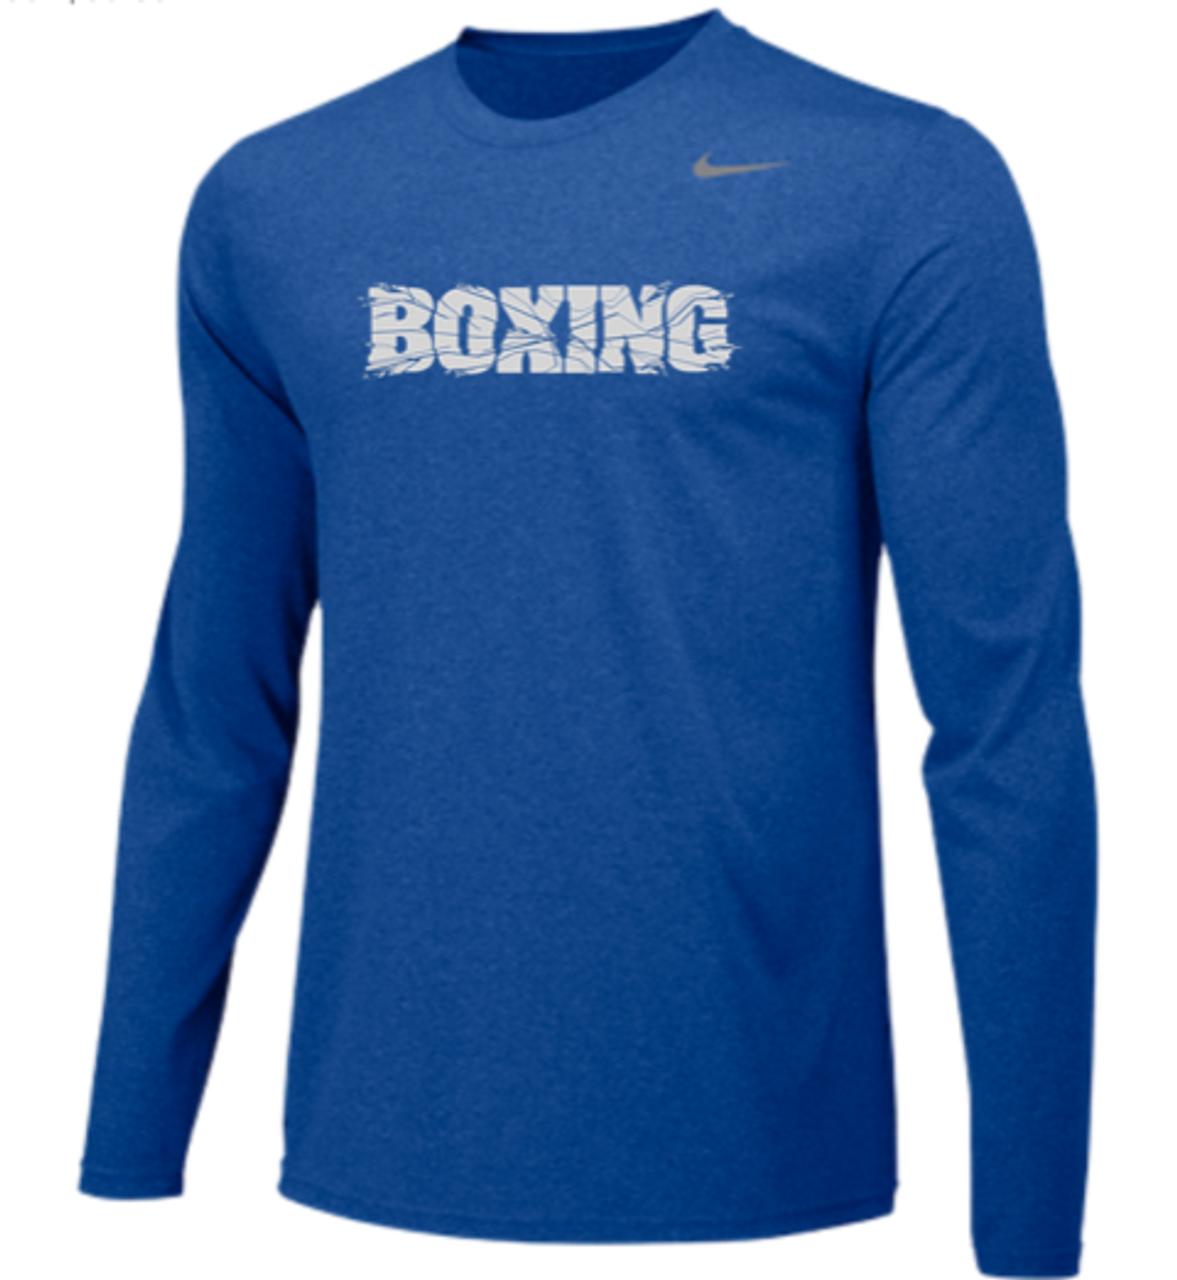 da7bd89dd17 Nike Men's Boxing Team Legend LS Crew -Royal/Silver